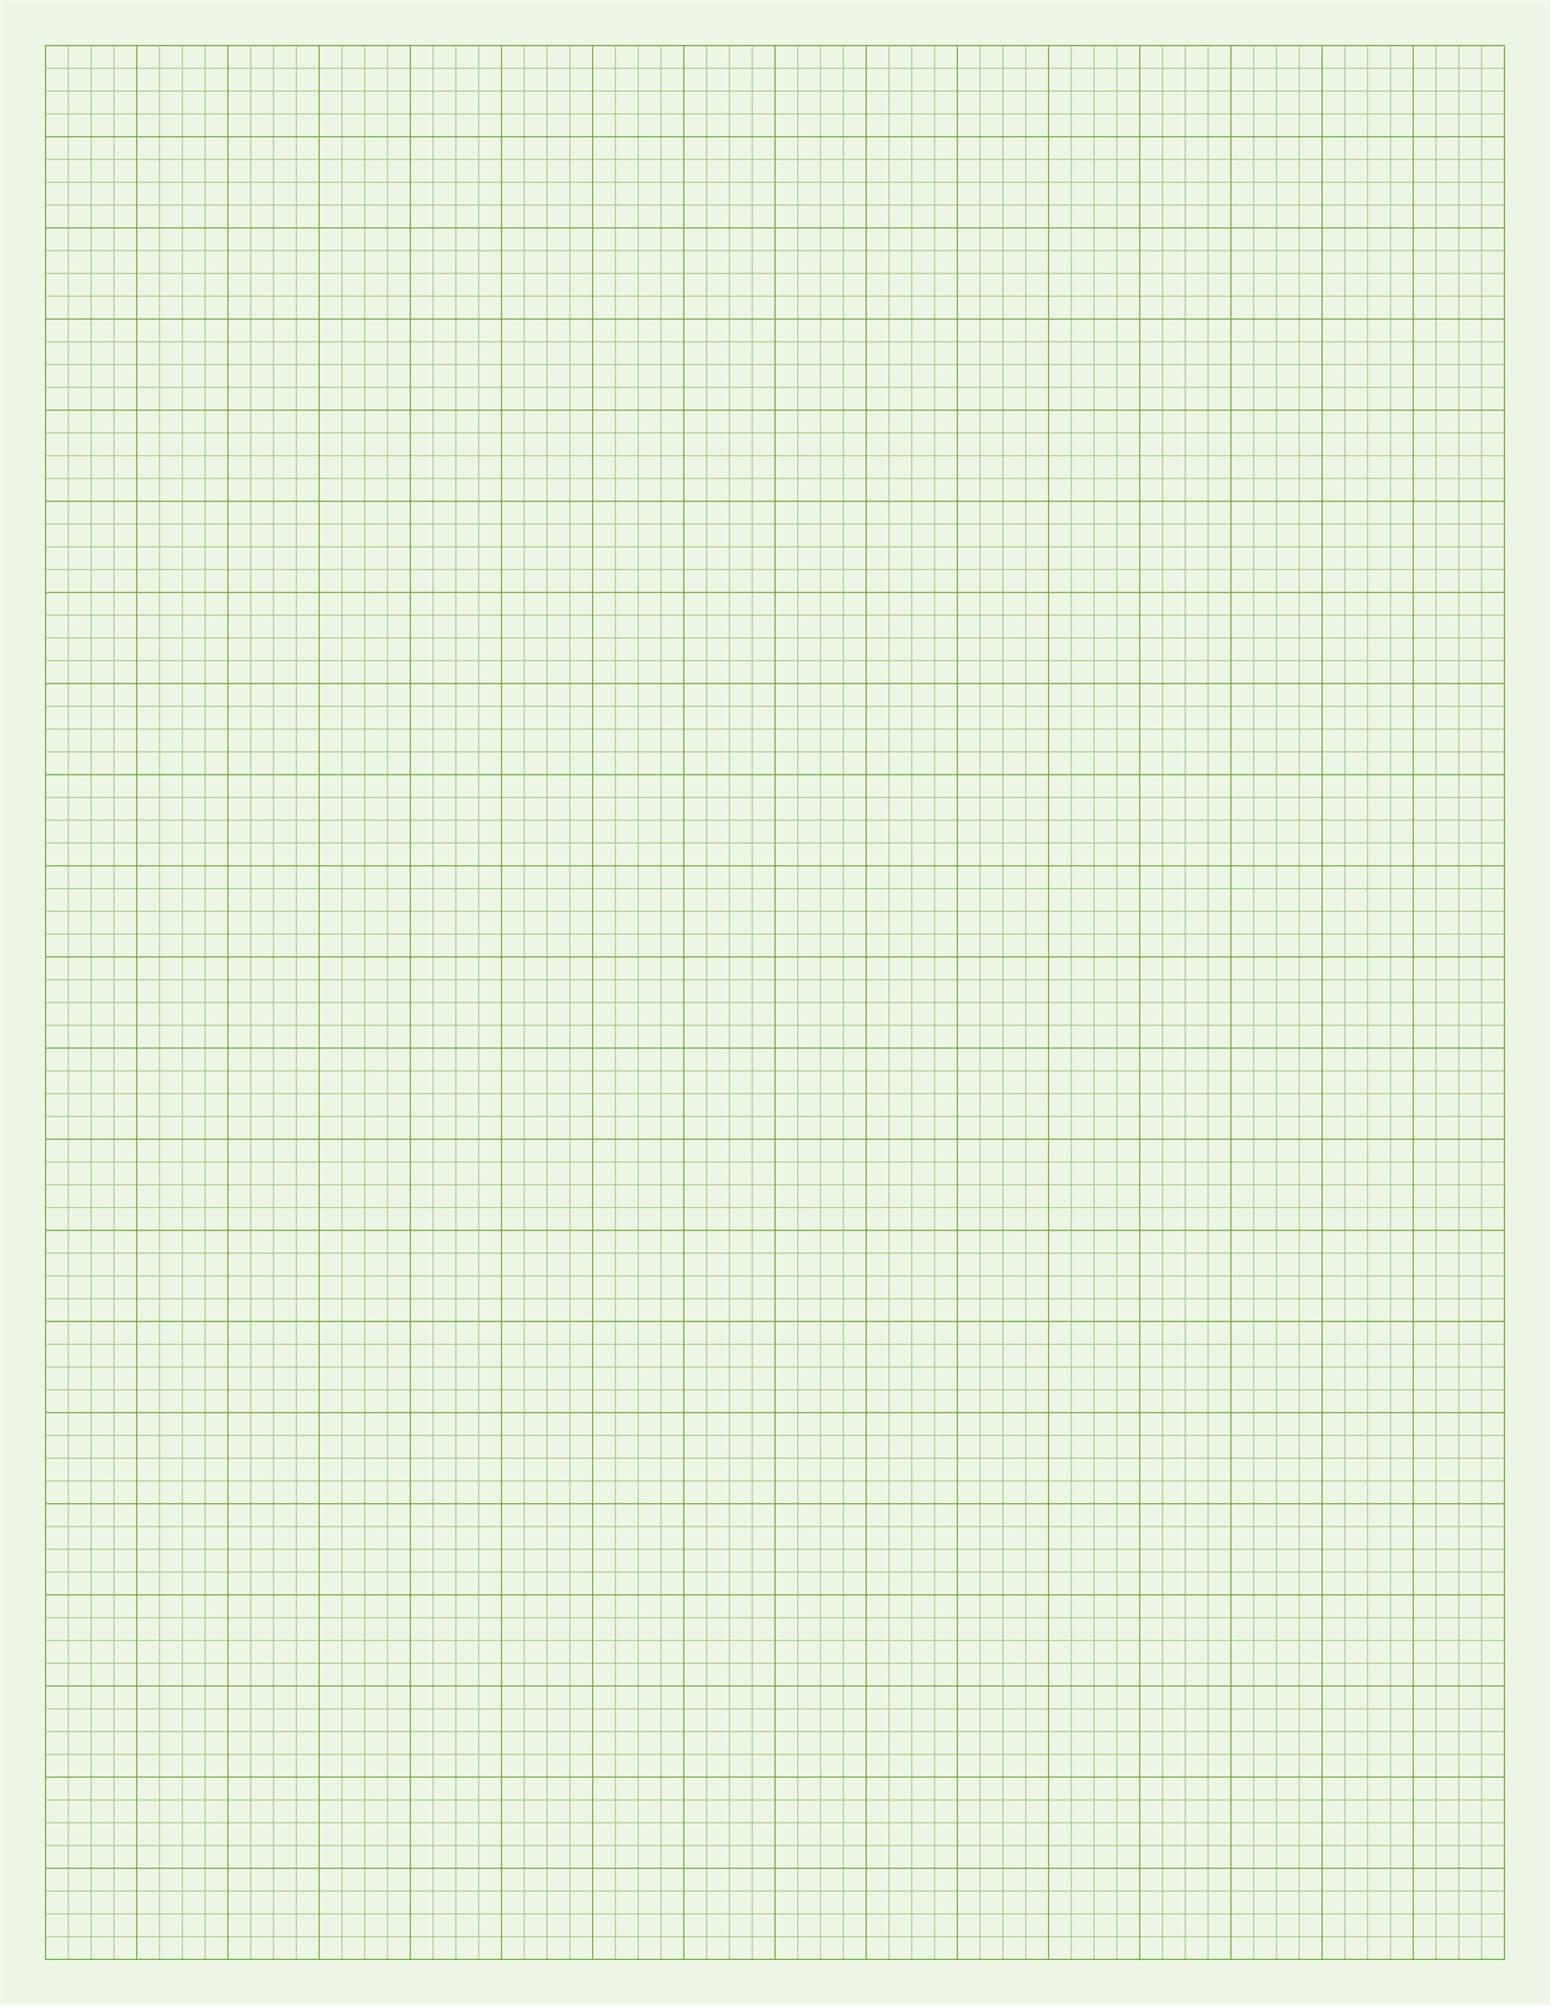 LaTeX 制作的不同纸张的背景类型 - 总有一款适合你